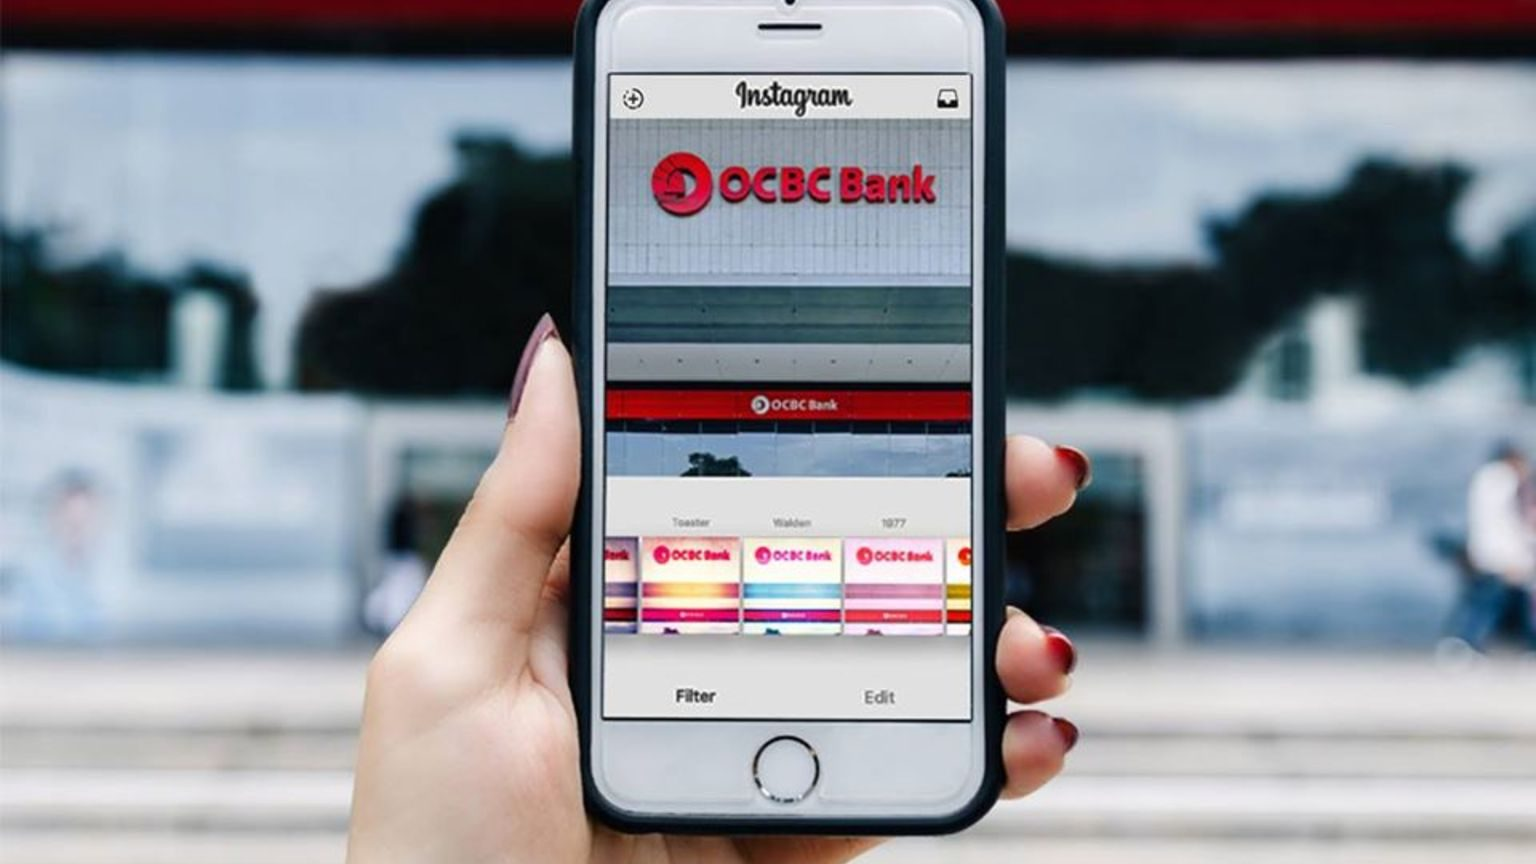 OCBC App